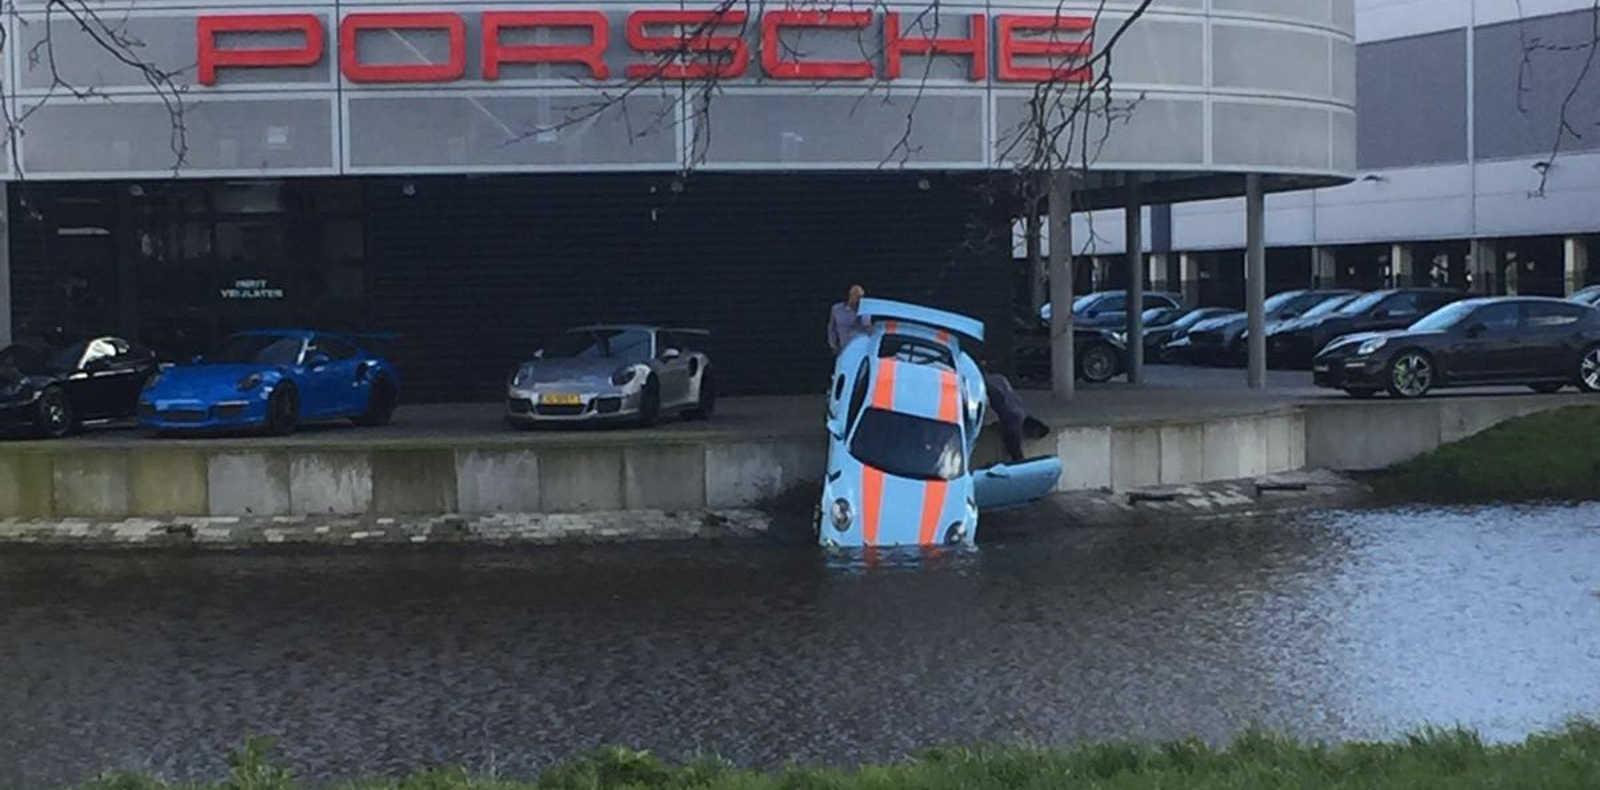 El Porsche que el mecanico arrojó al agua (Foto: Autovisie)